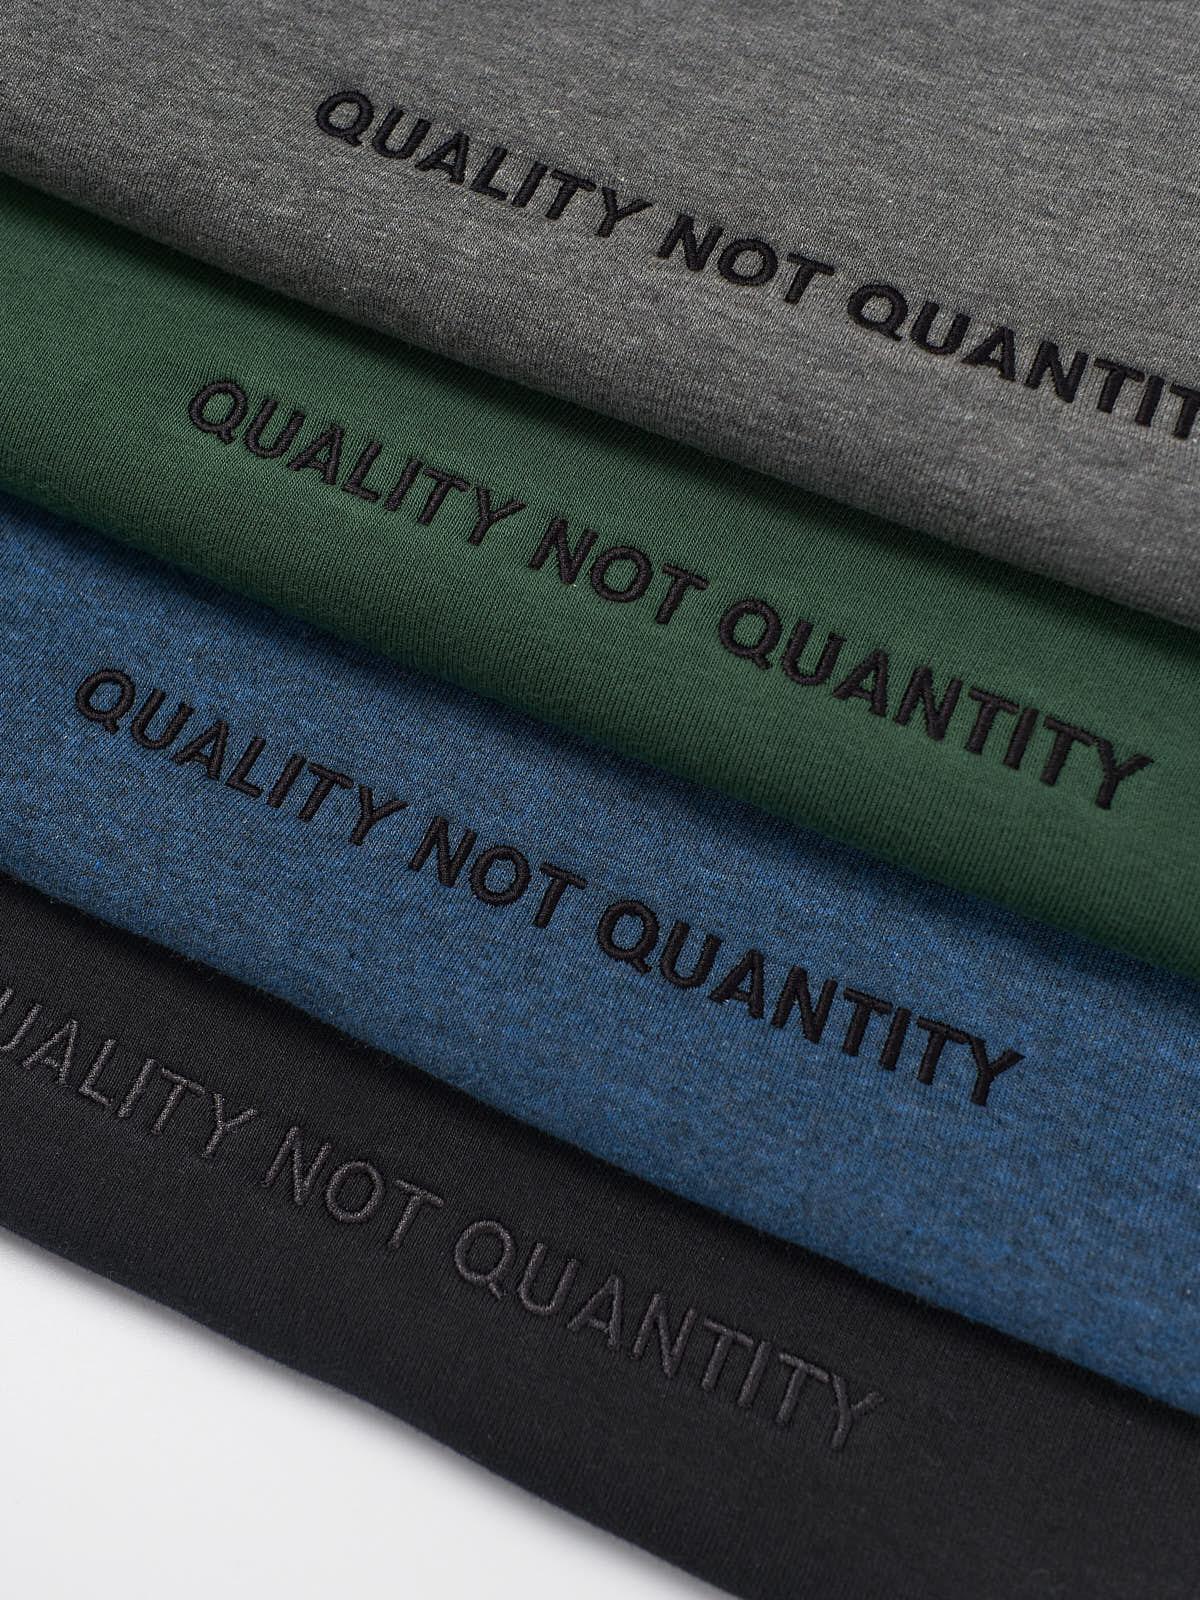 Quality not quantity sweatshirts folded